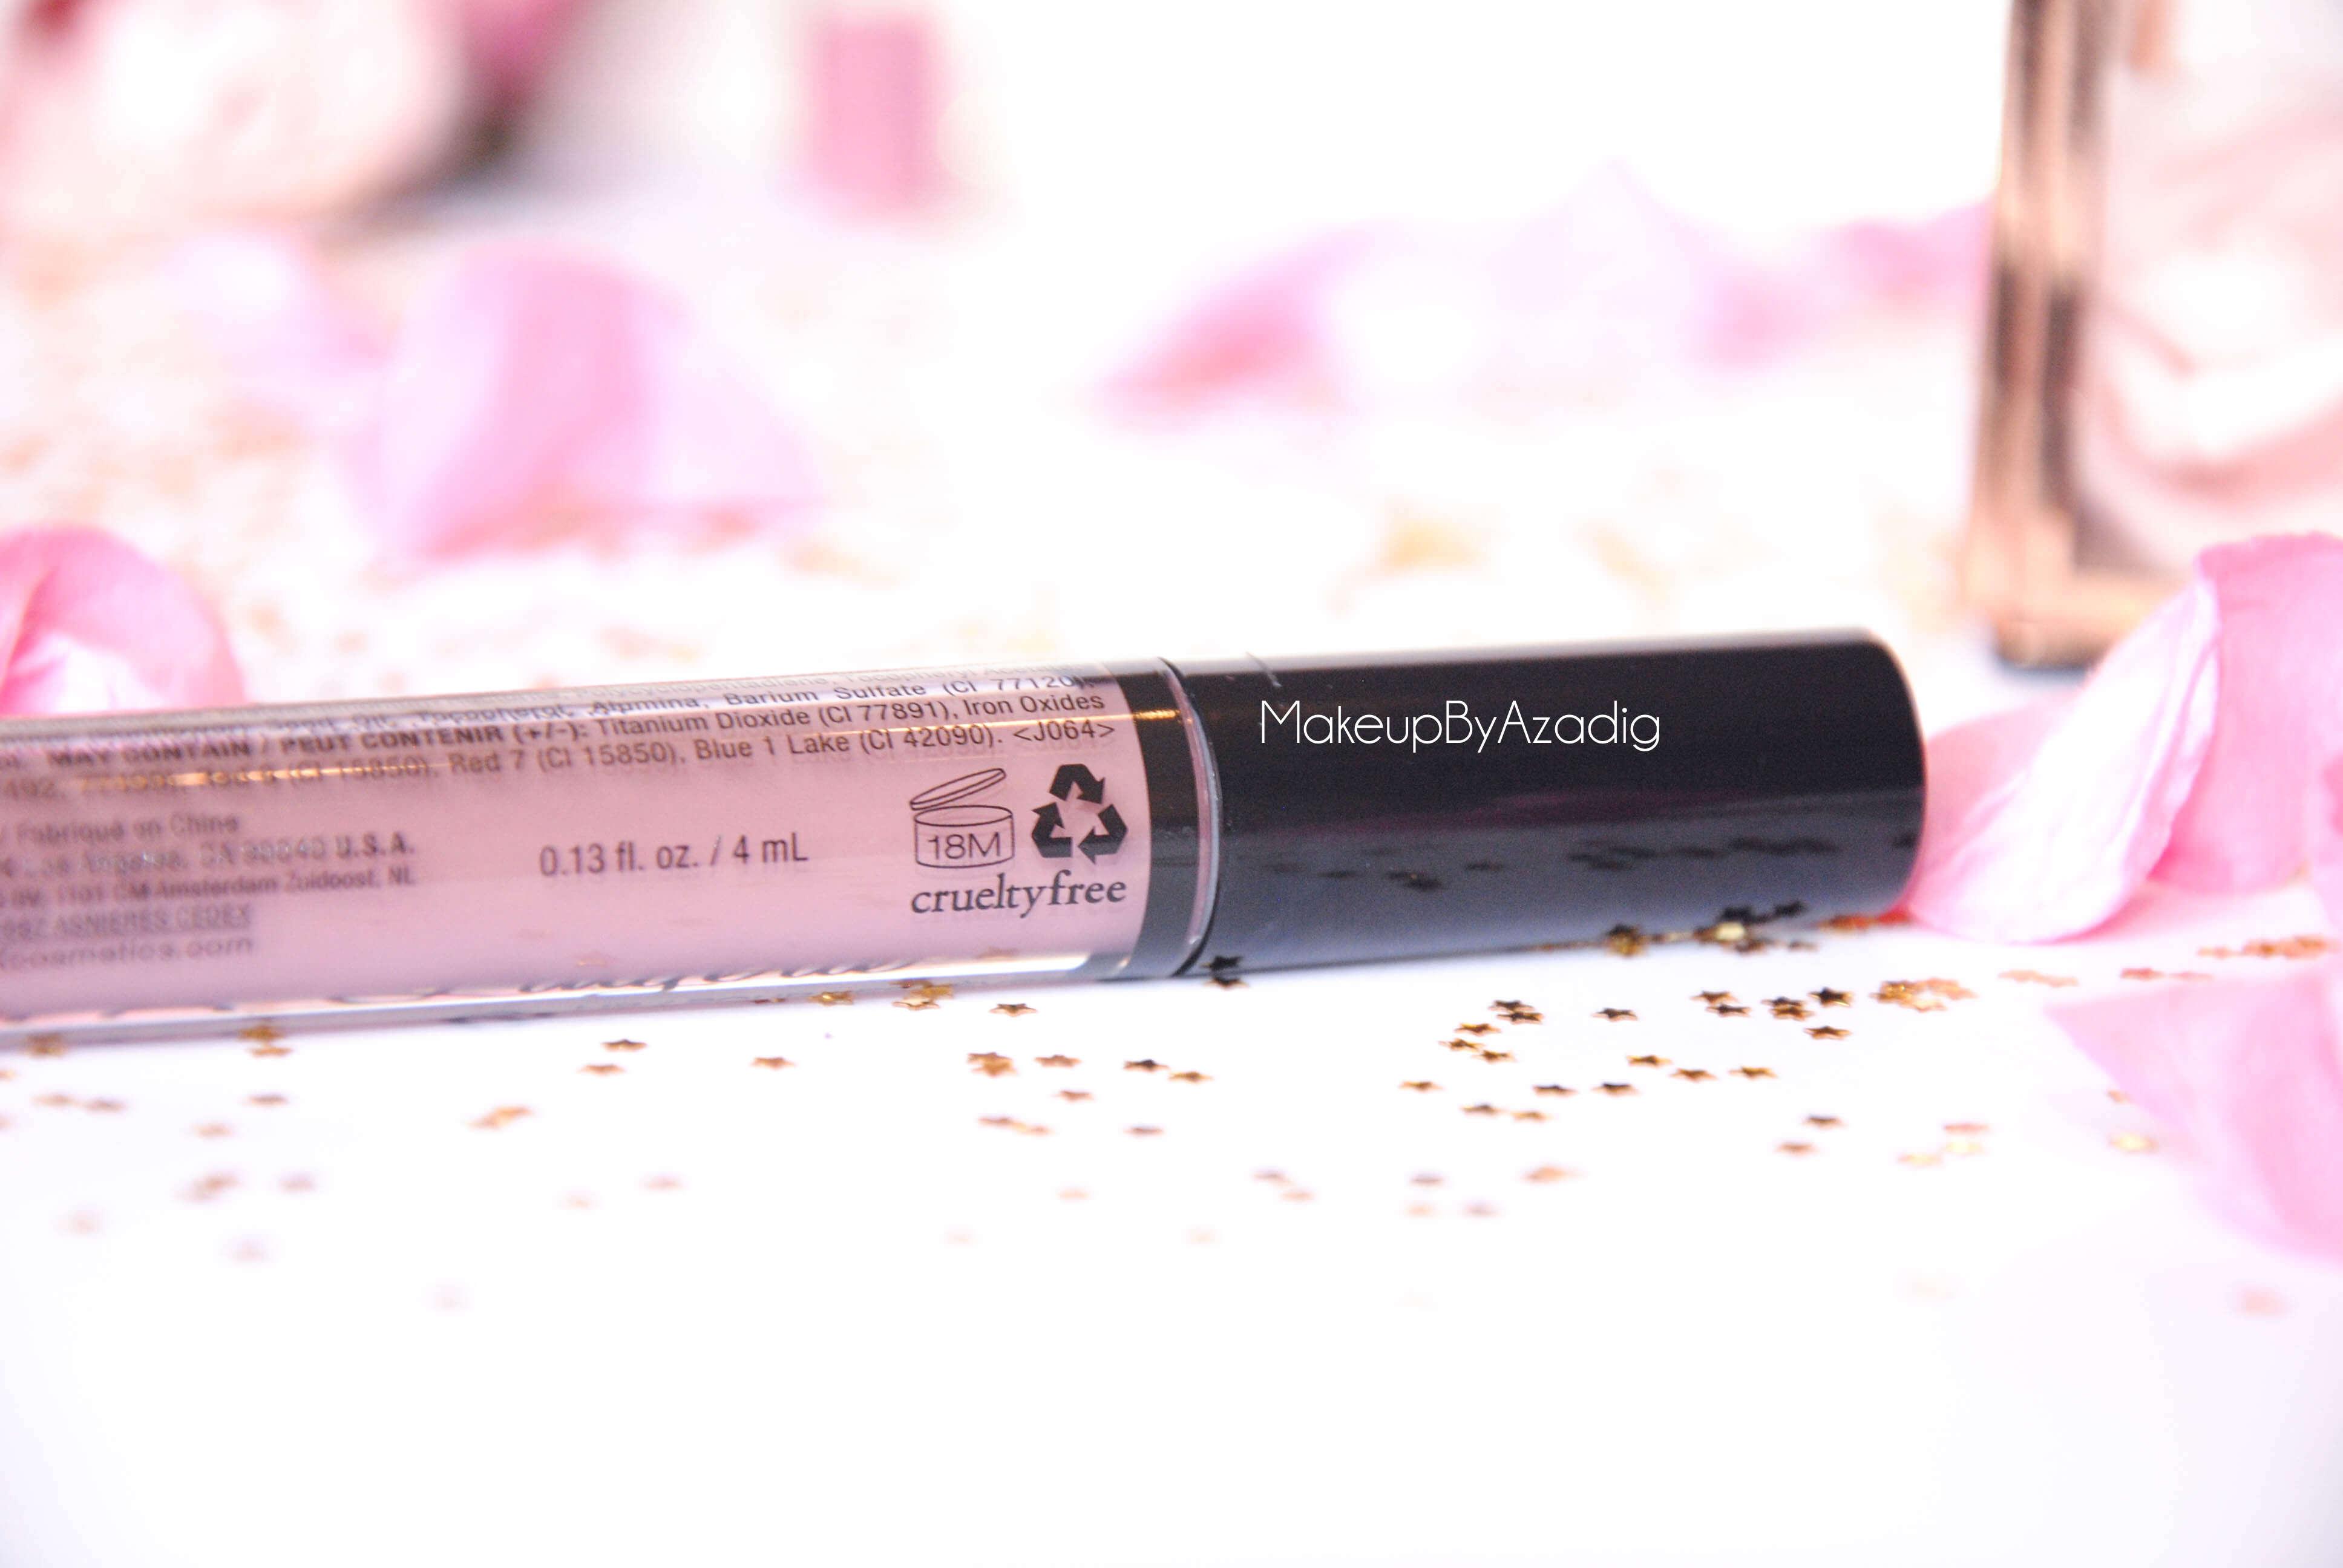 lip lingerie - revue - swatch- nyx cosmetics - embellishment - bedtime flirt - makeupbyazadig - enjoyphoenix - troyes - cruelty free